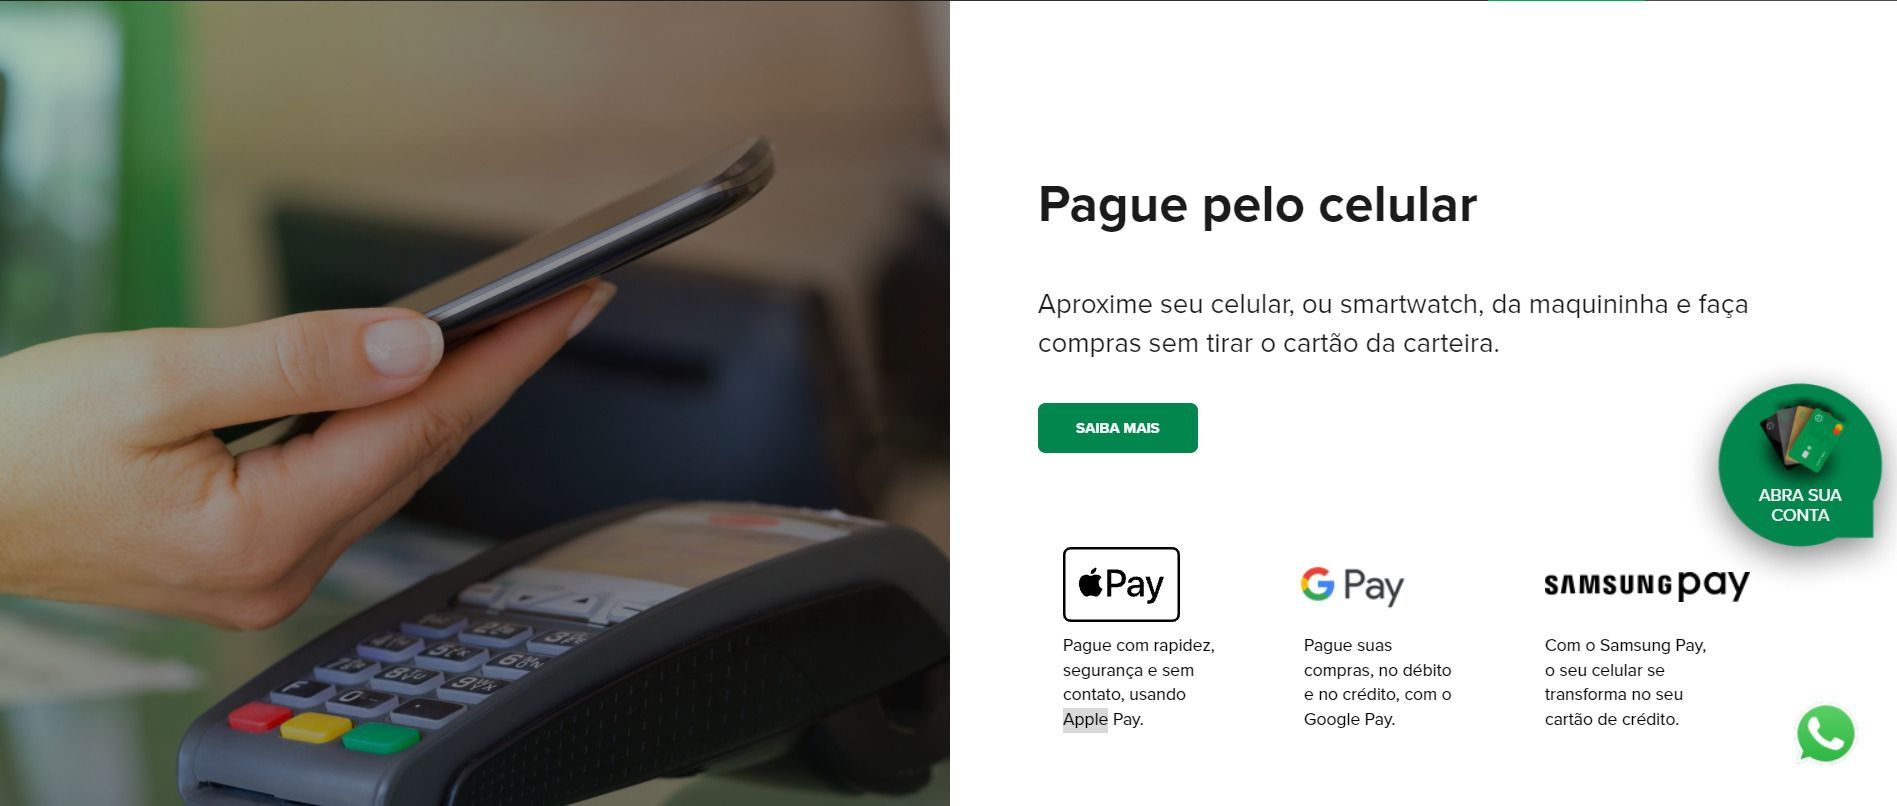 Apple Pay banco original 1